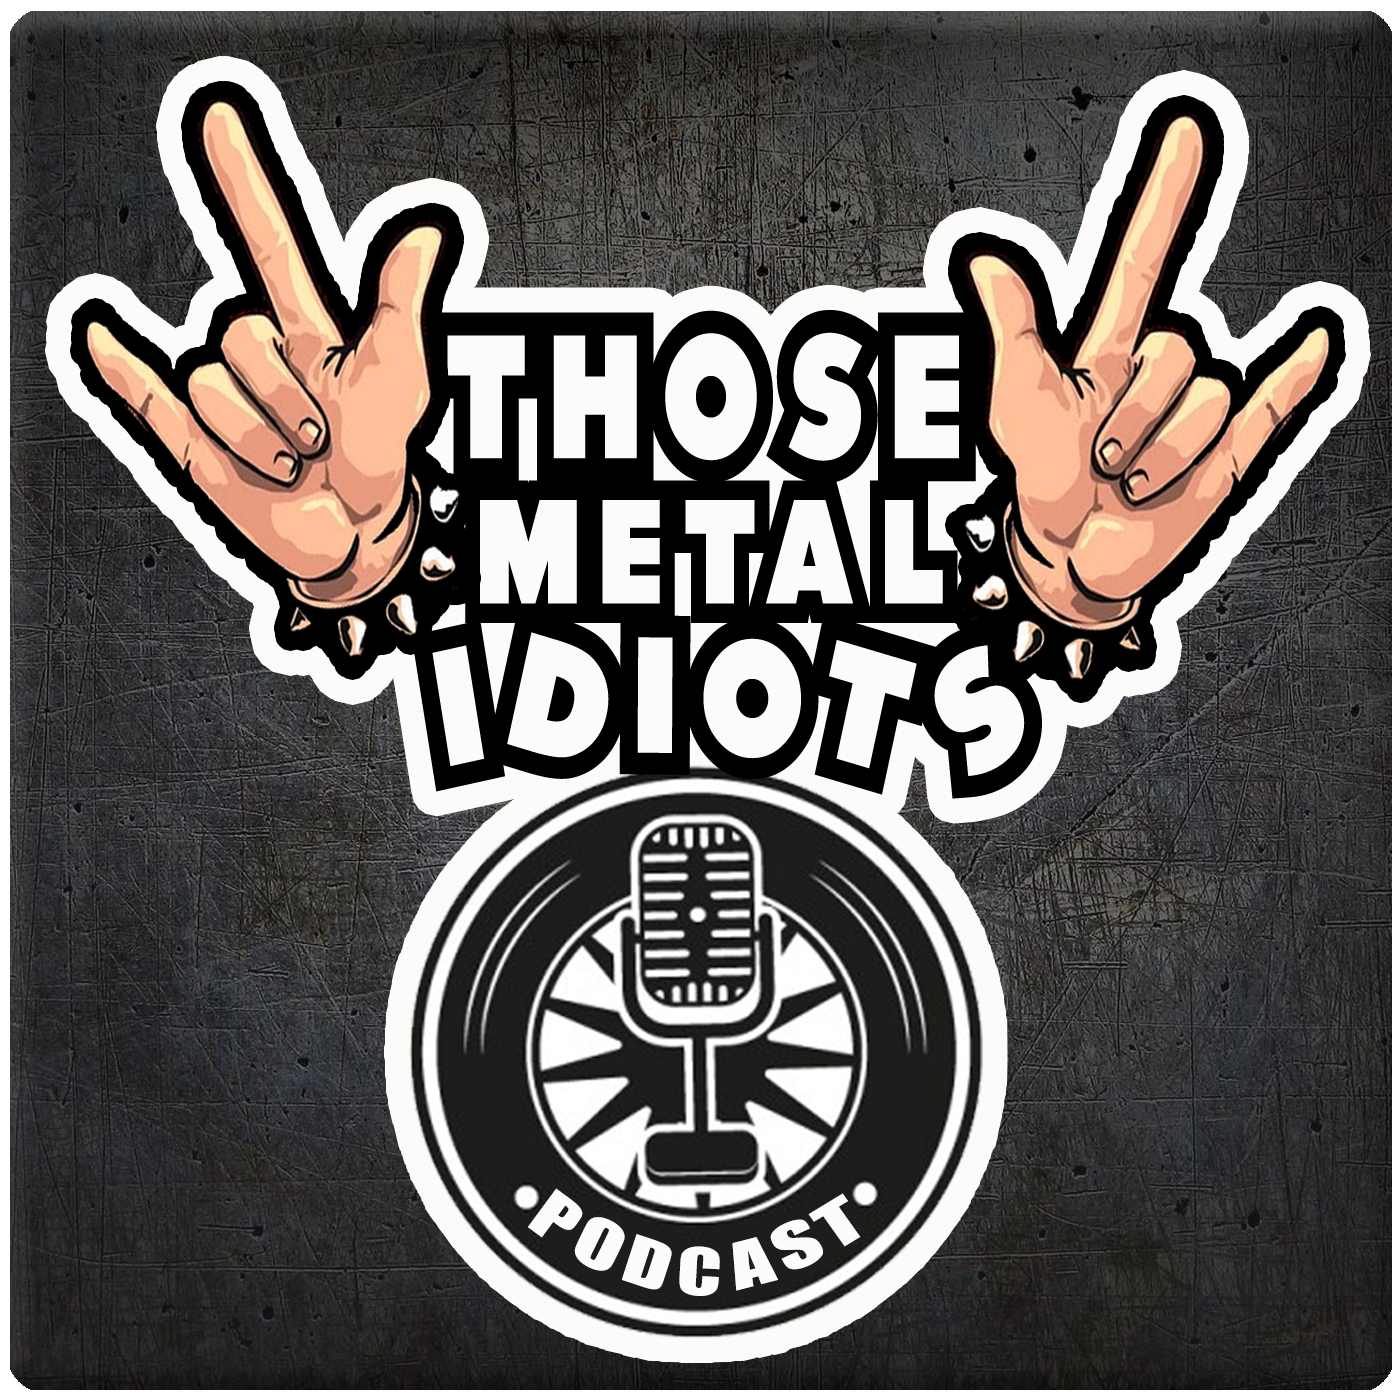 Those Metal Idiots logo